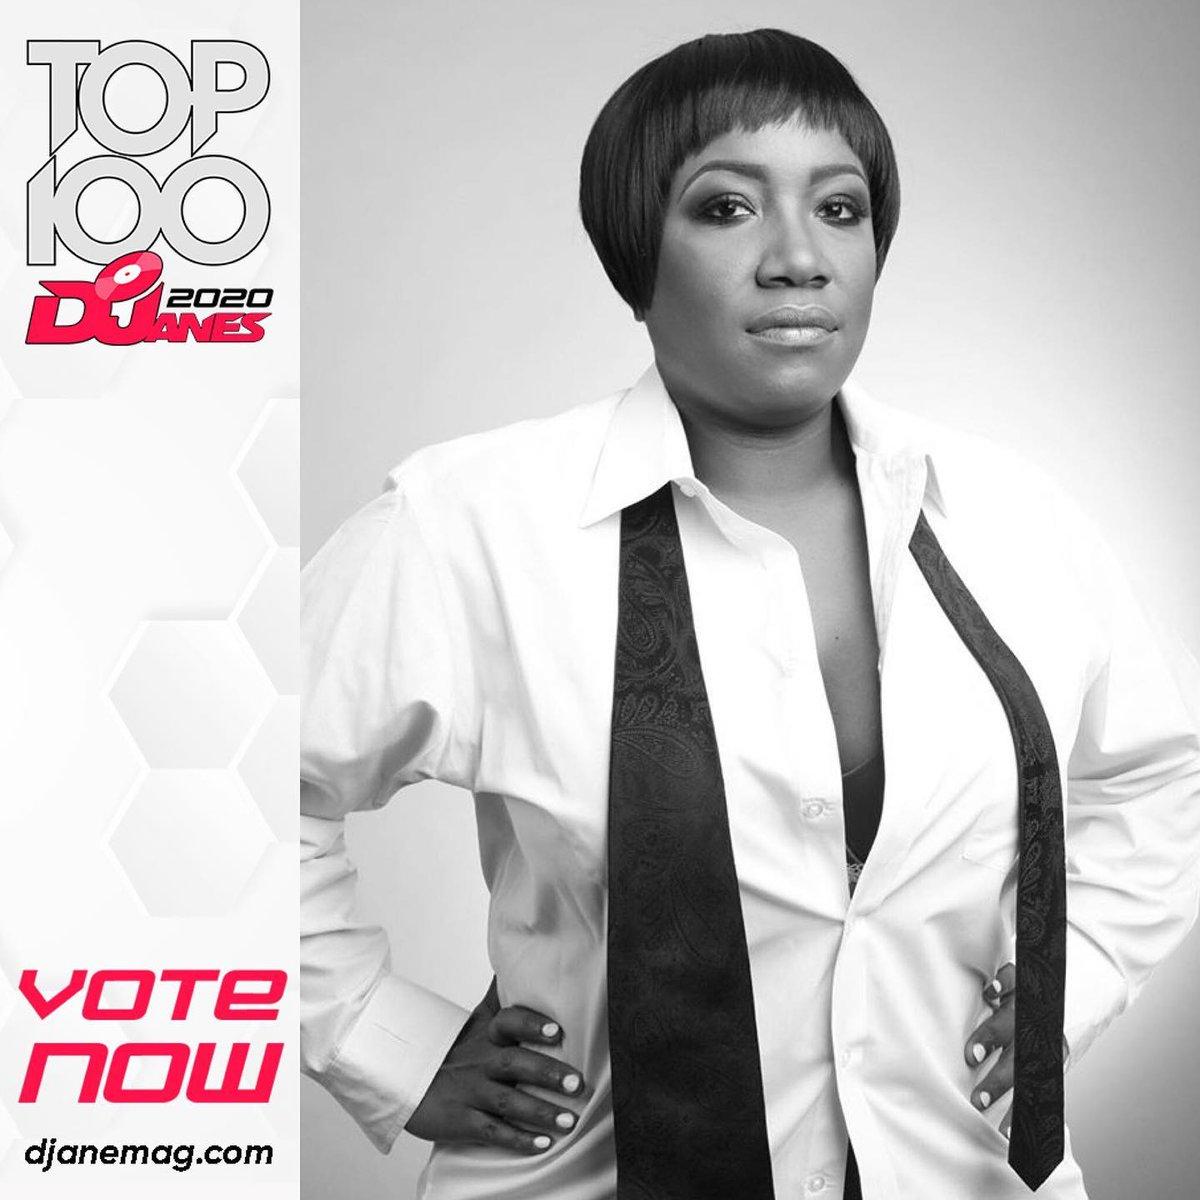 Virus will go away, Music will stay forever! VOTE NOW for @iamdjsupastar on http://djanemag.com http://top100djanes.com #djanemag #top100djanes #dj #djs #djlife #djingpic.twitter.com/qZw1awpq6p